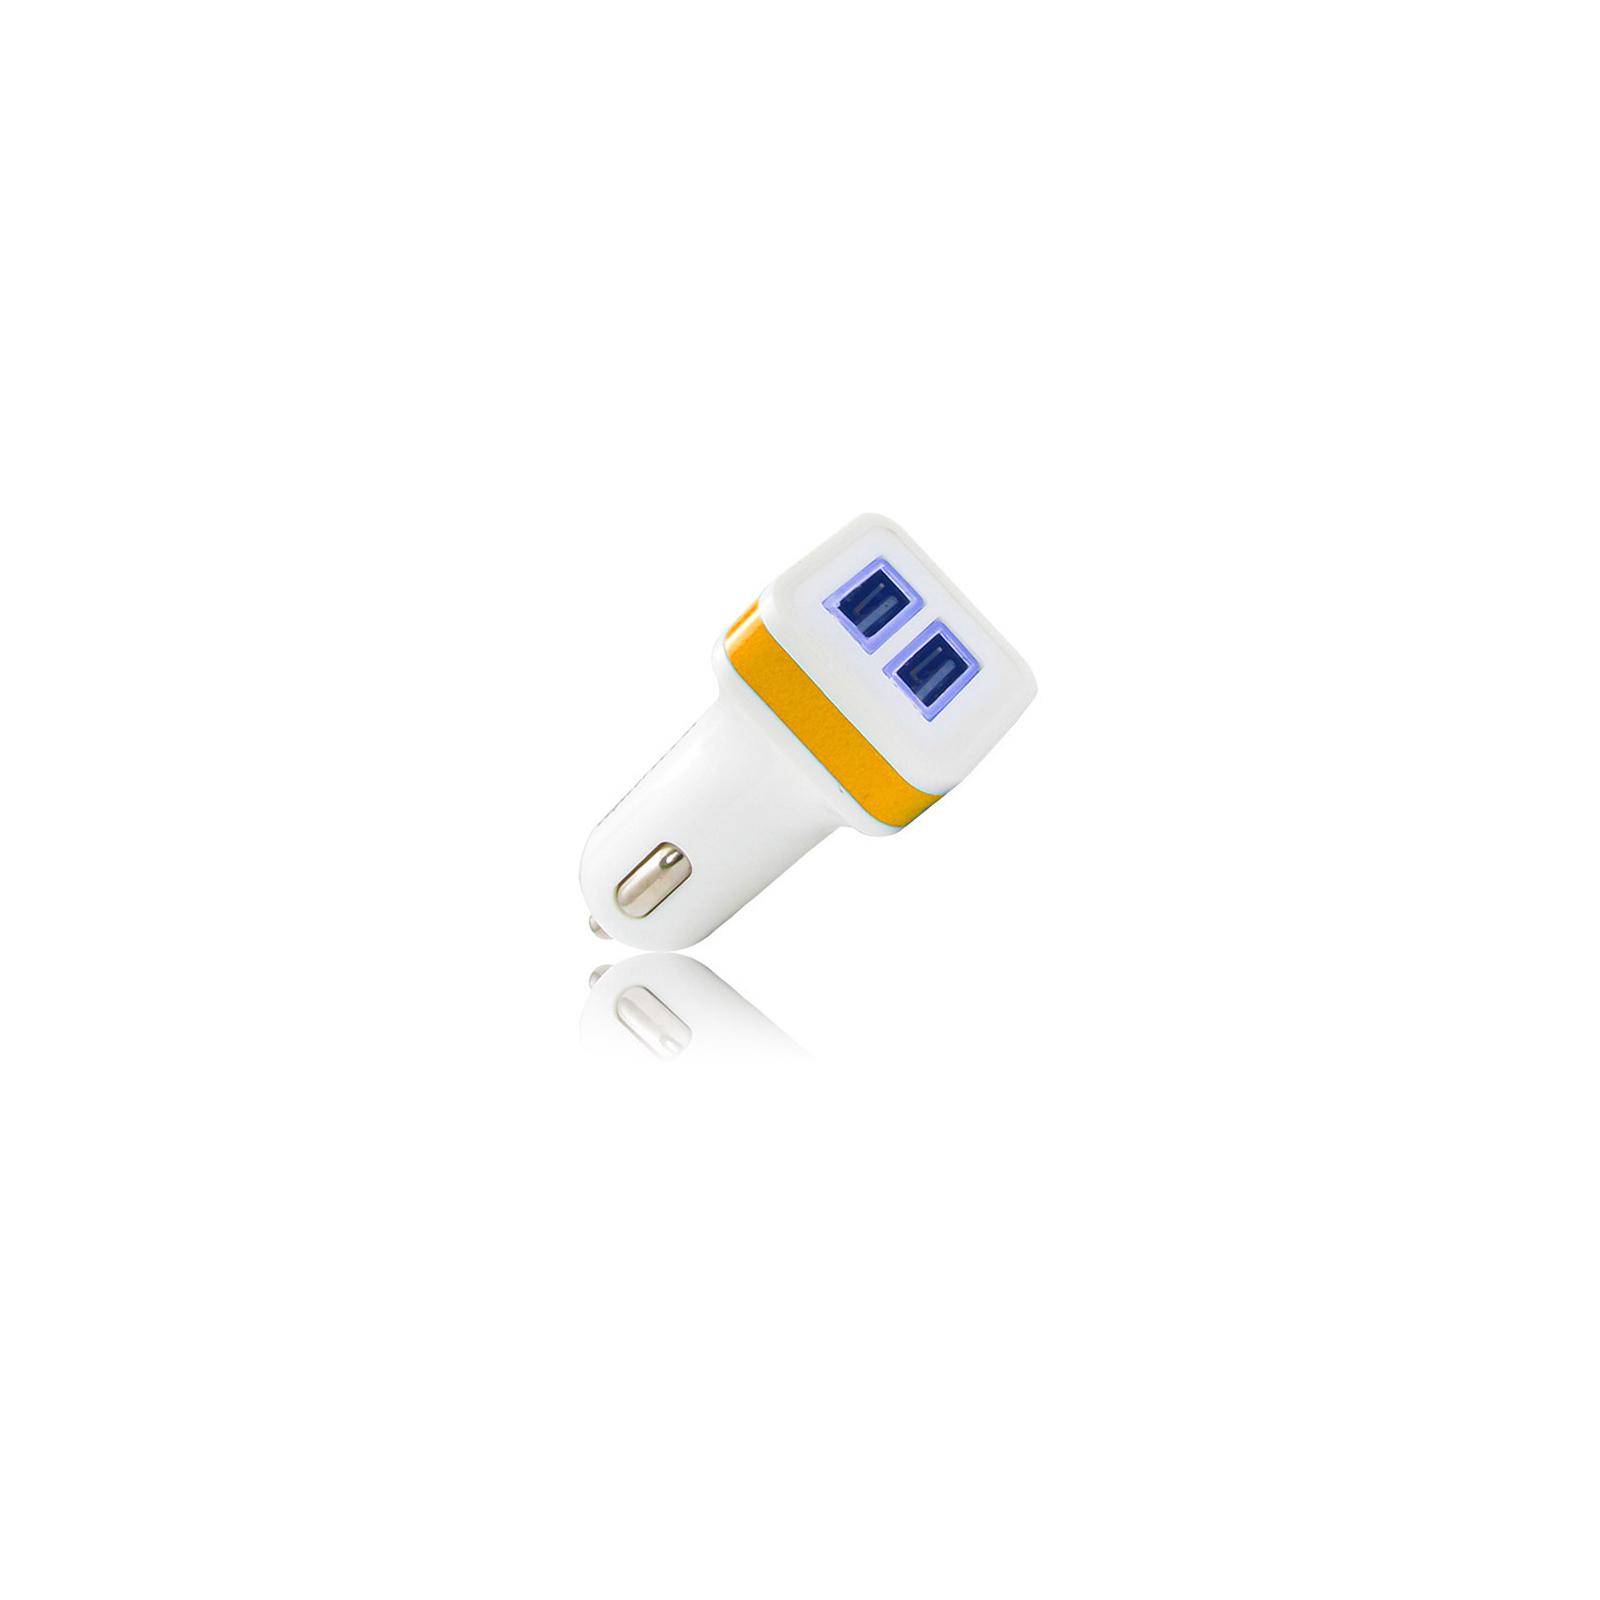 Зарядное устройство Gelius Gold Edition USB*2 2.4A White/Orange (36832)